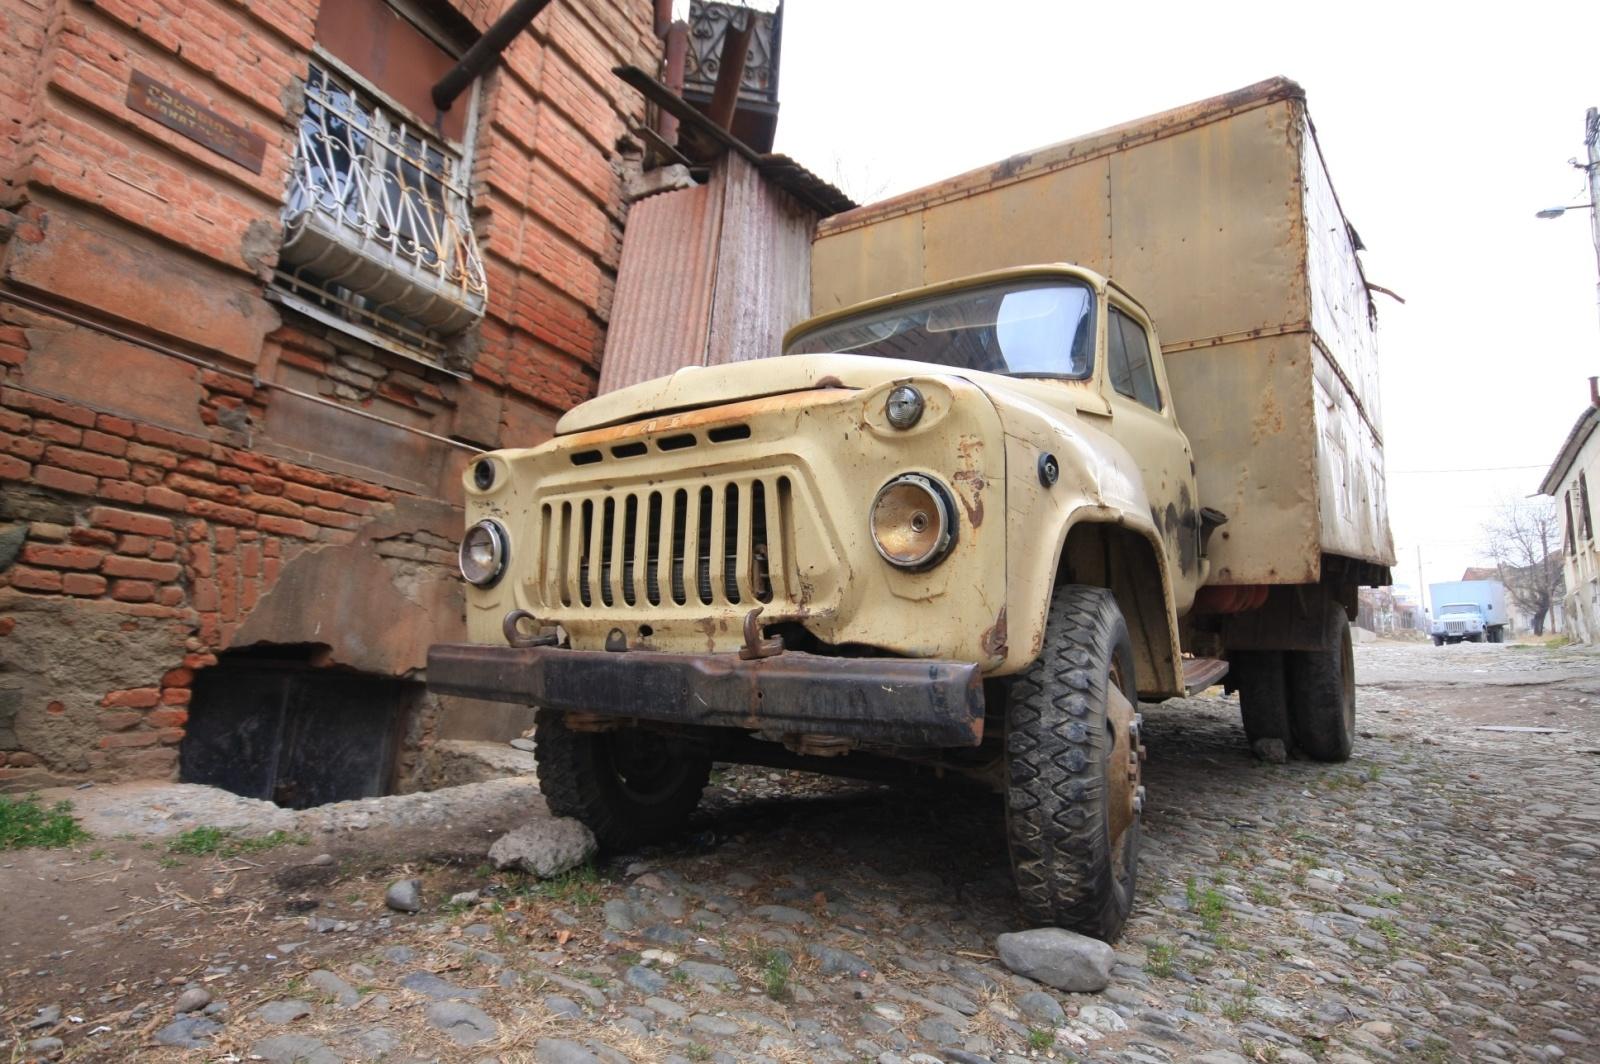 Avlabari has a very nice retro truck exhibition all over